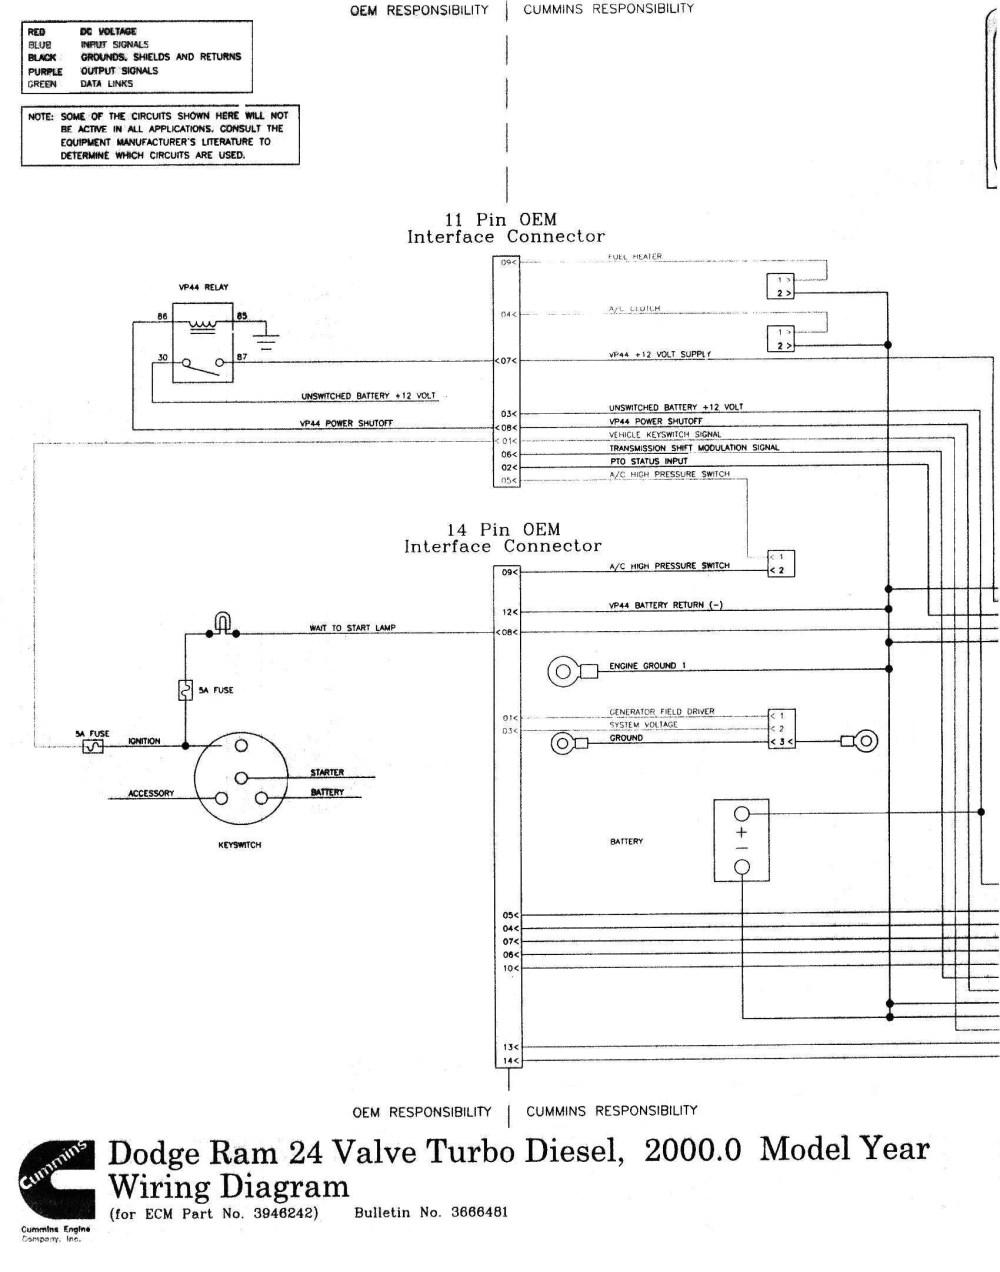 medium resolution of ram 2500 wiring diagram electrical schematic wiring diagram wiring diagram for dodge ram 1500 2003 wiring